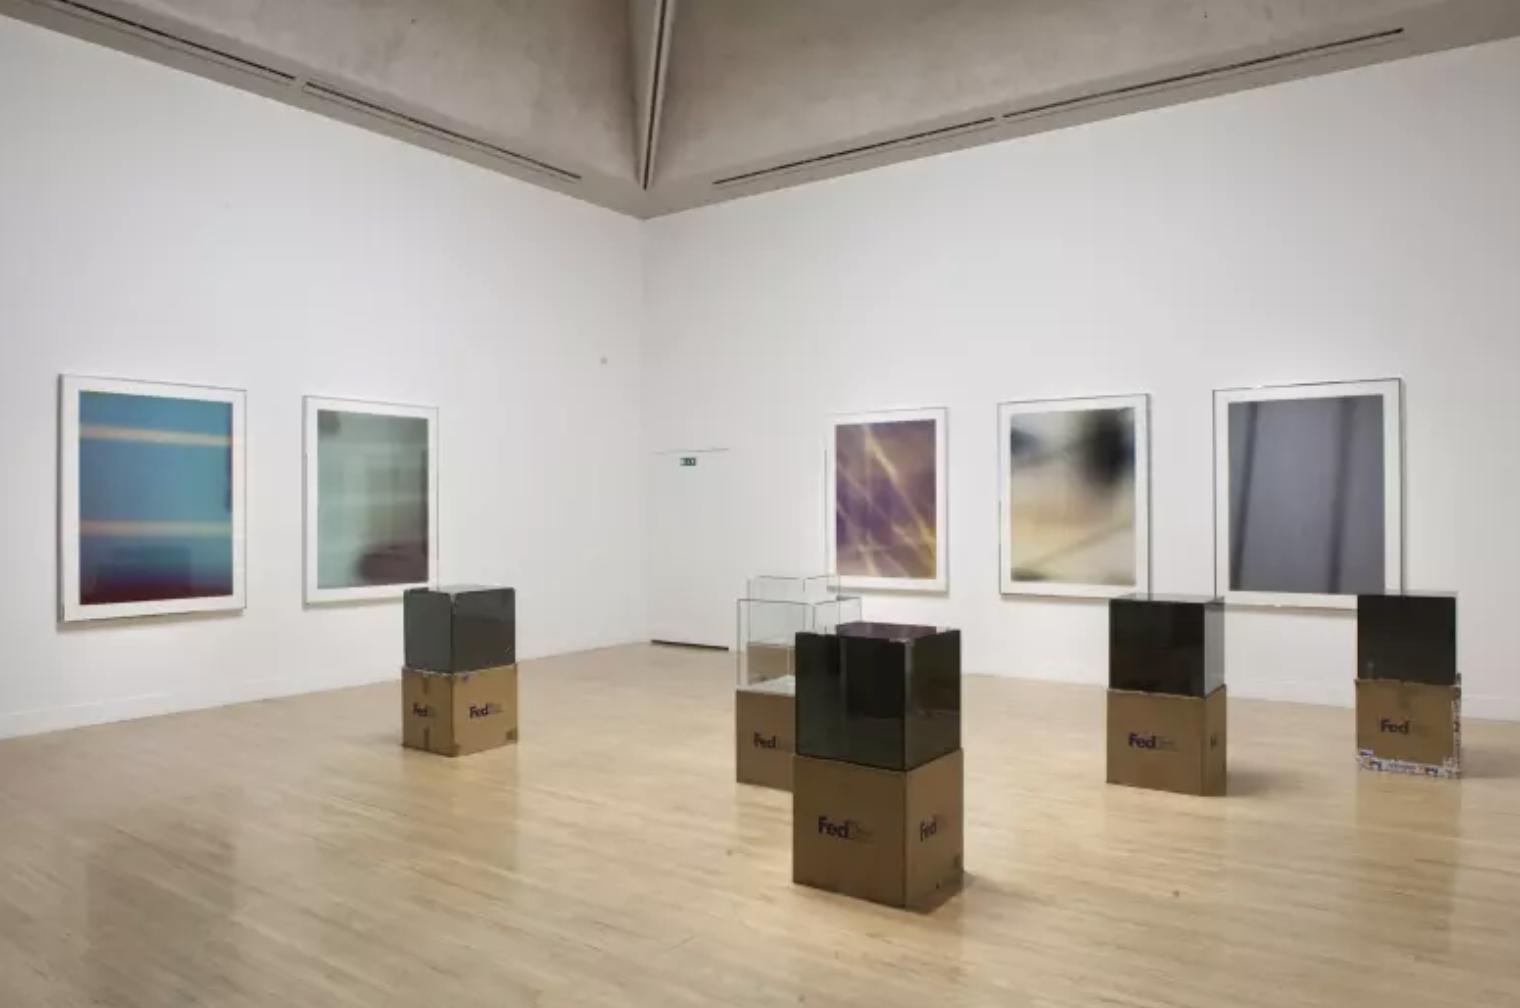 Walead Beshty,  Altermodern: The Tate Triennial  (2009)  installation view Tate Britain, London